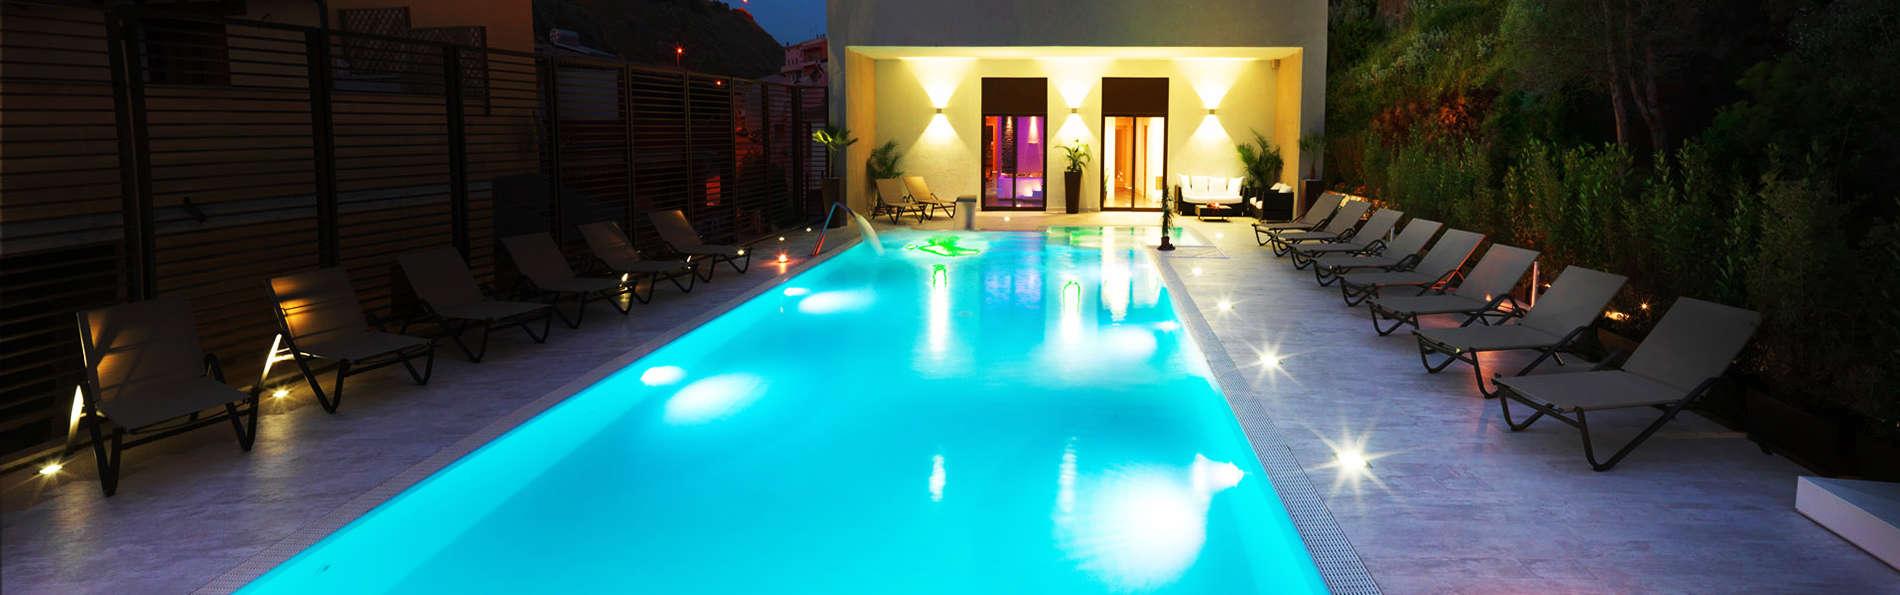 Hotel Riviera Ristorante Fofó - EDIT_HOTELRIVIERA-PISCINA.jpg